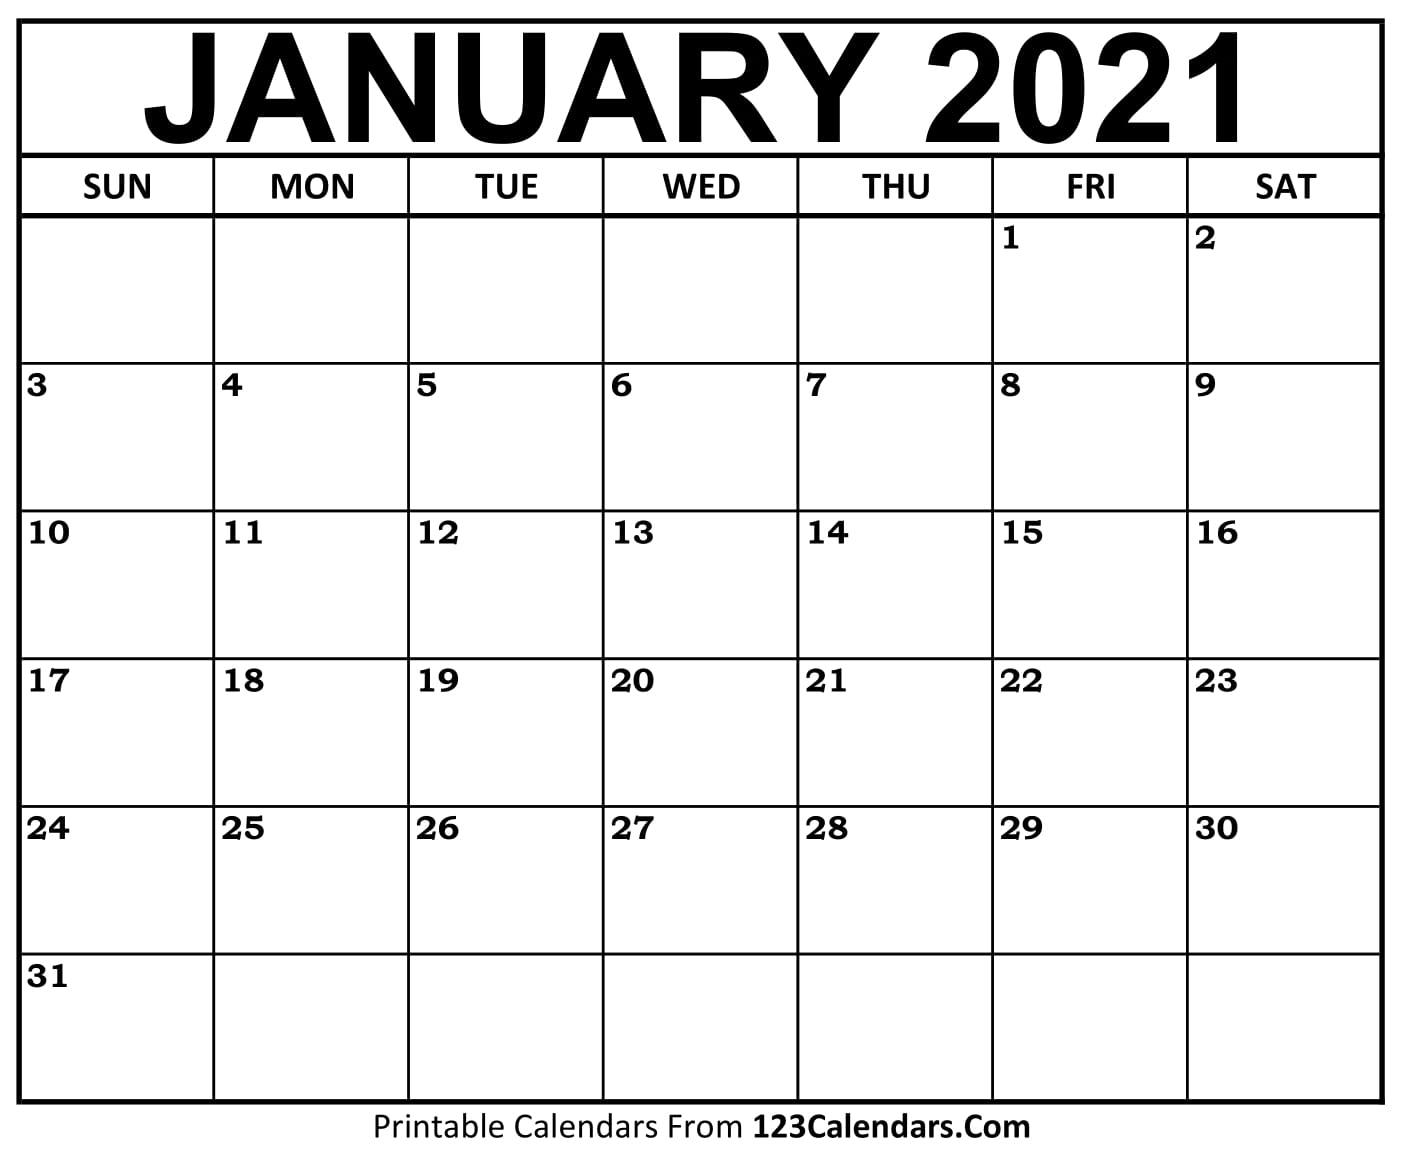 Printable January 2021 Calendar Templates | 123Calendars intended for Printable Calendar 2021 And Fill On